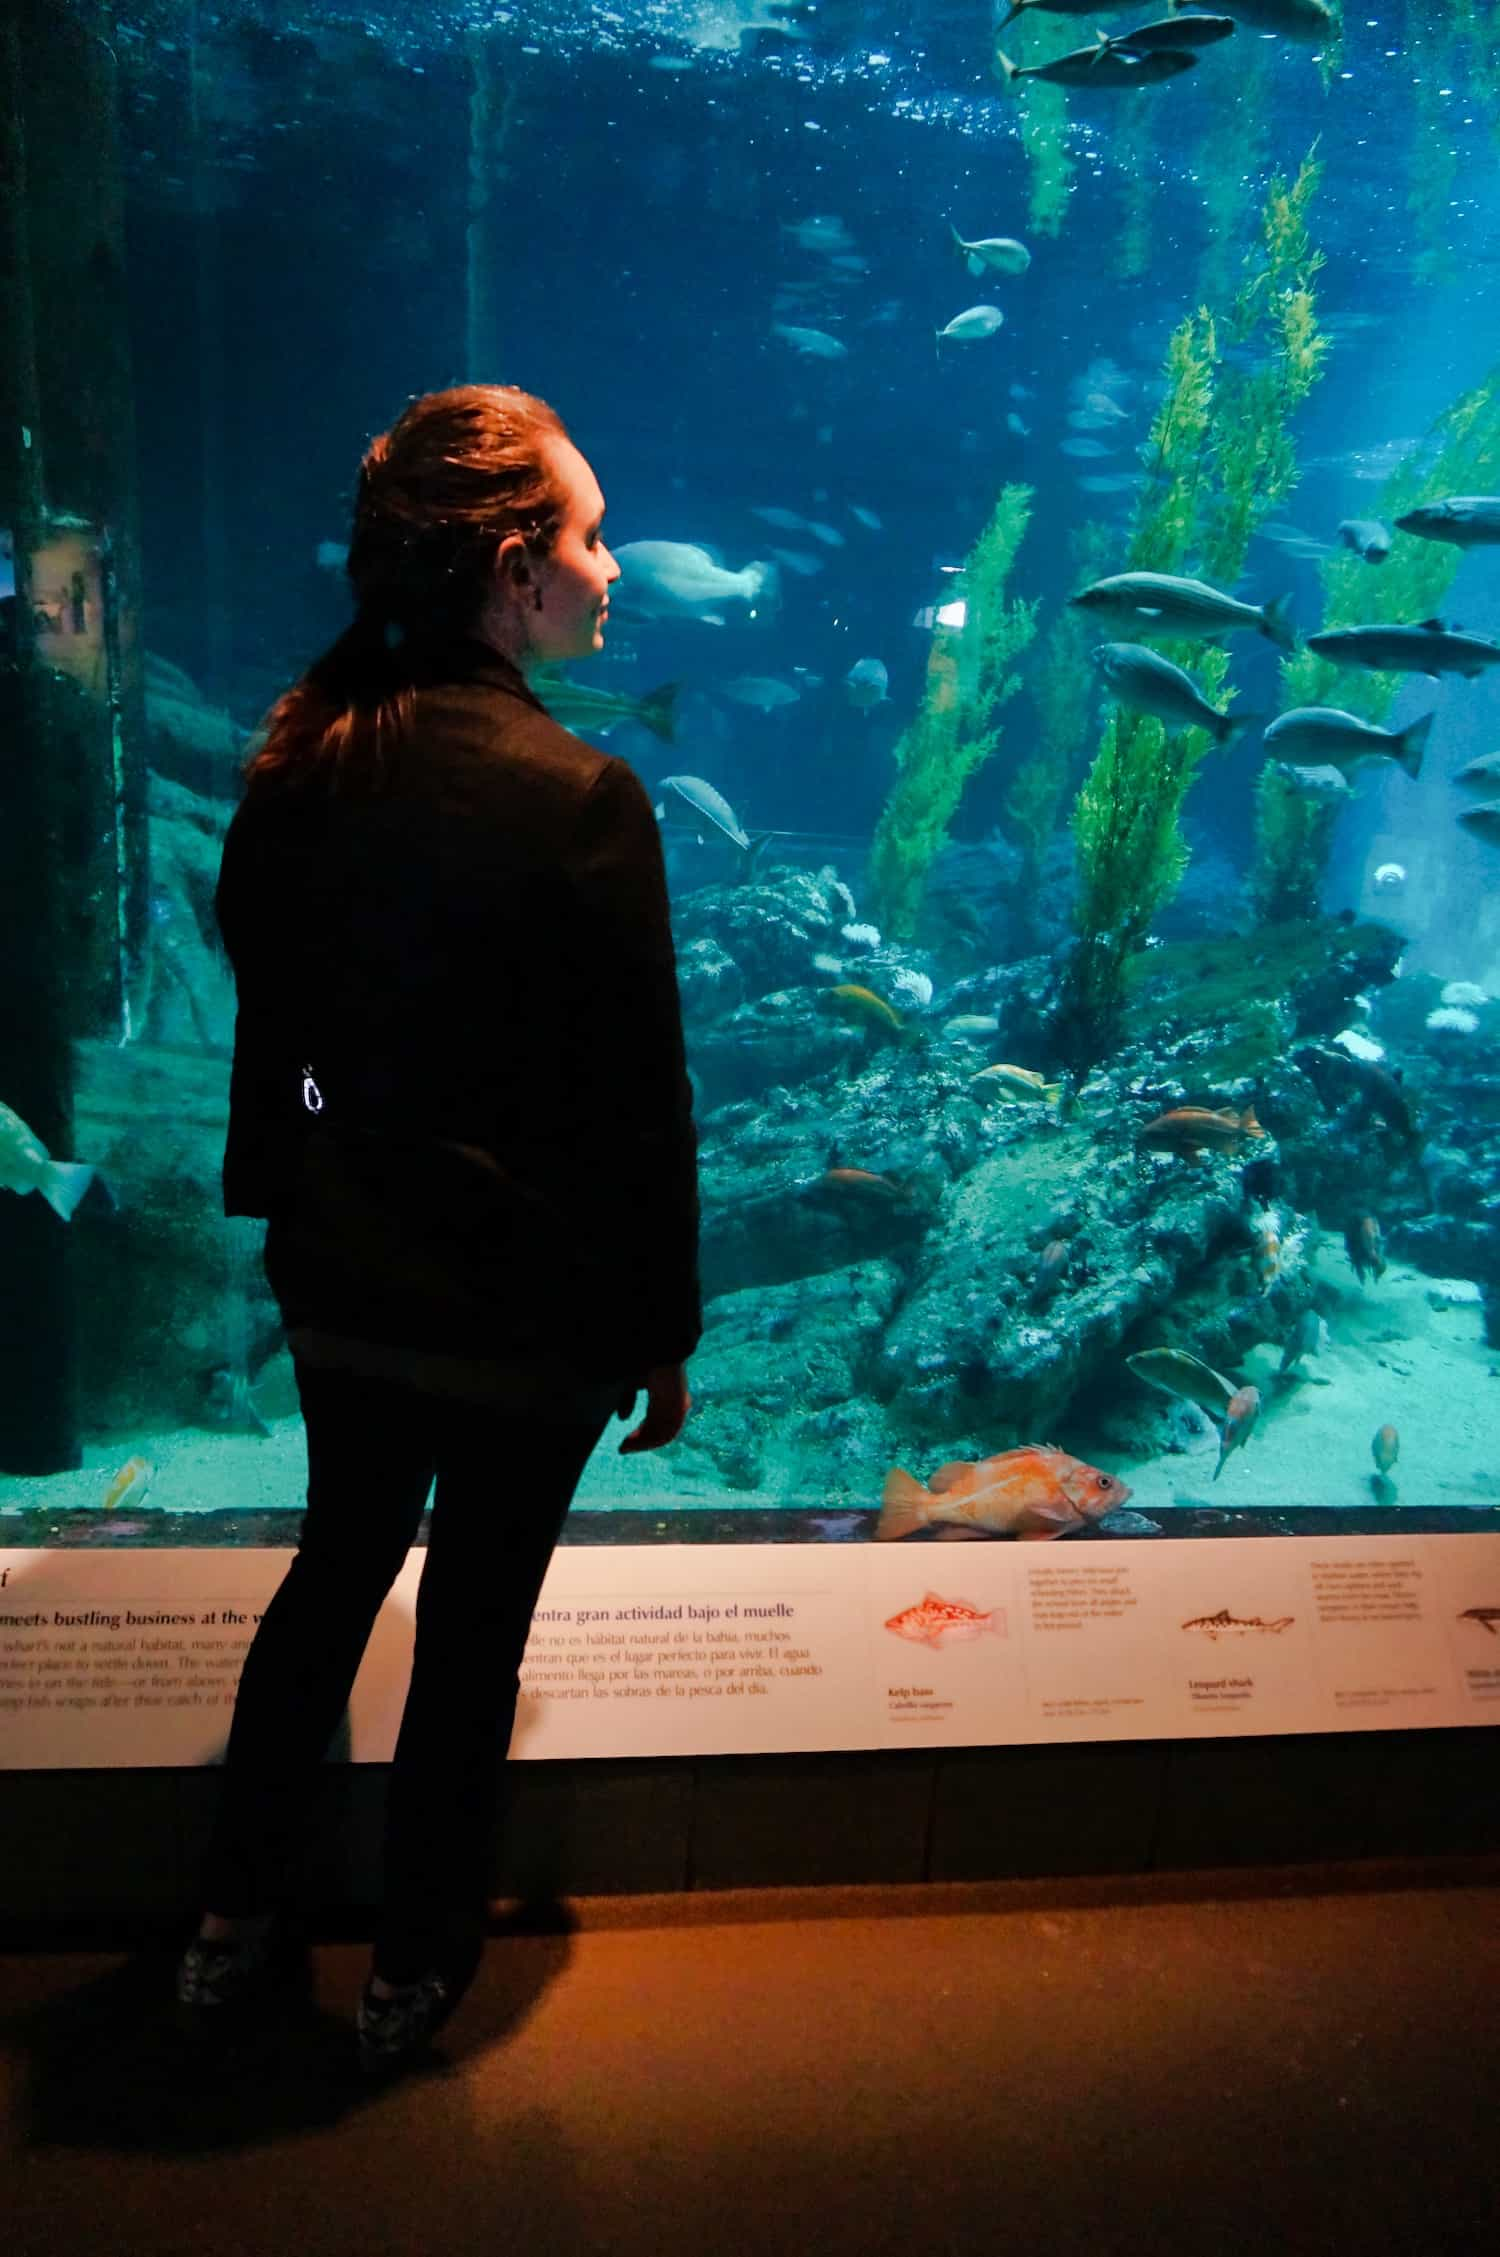 Standing at the Monterey Bay Aquarium